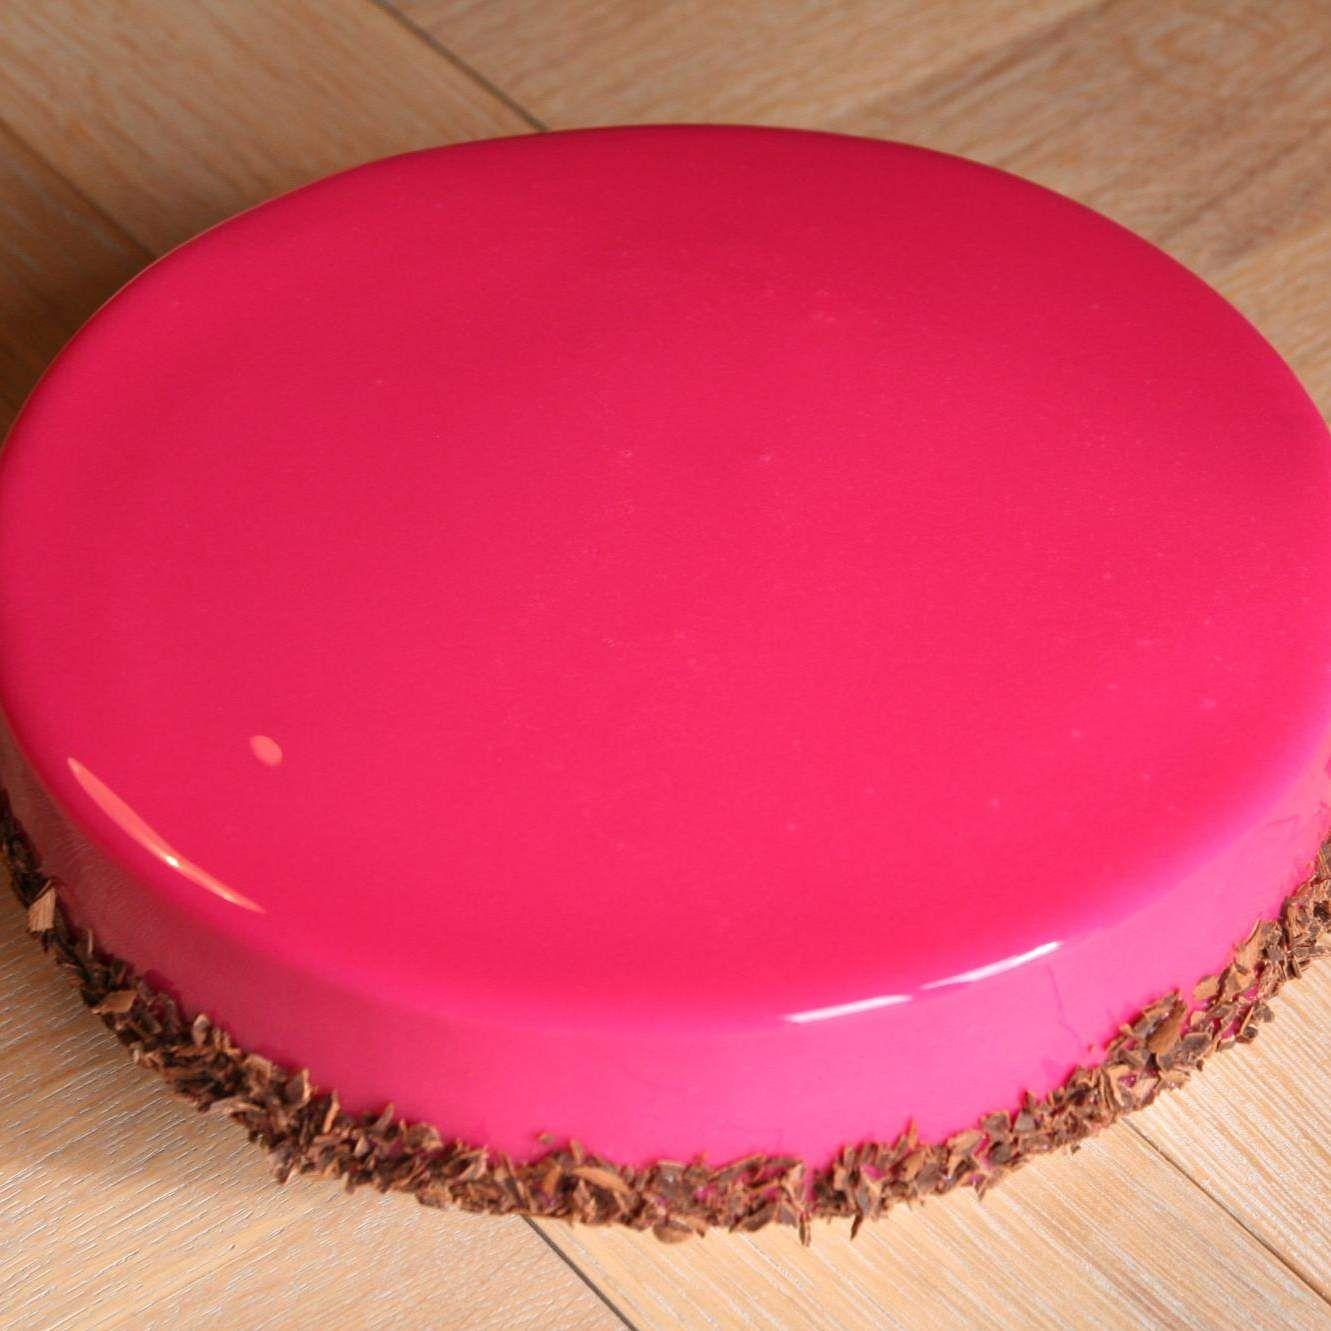 gla age miroir rouge recette birthday kids cakes pinterest desserts mirror glaze cake. Black Bedroom Furniture Sets. Home Design Ideas